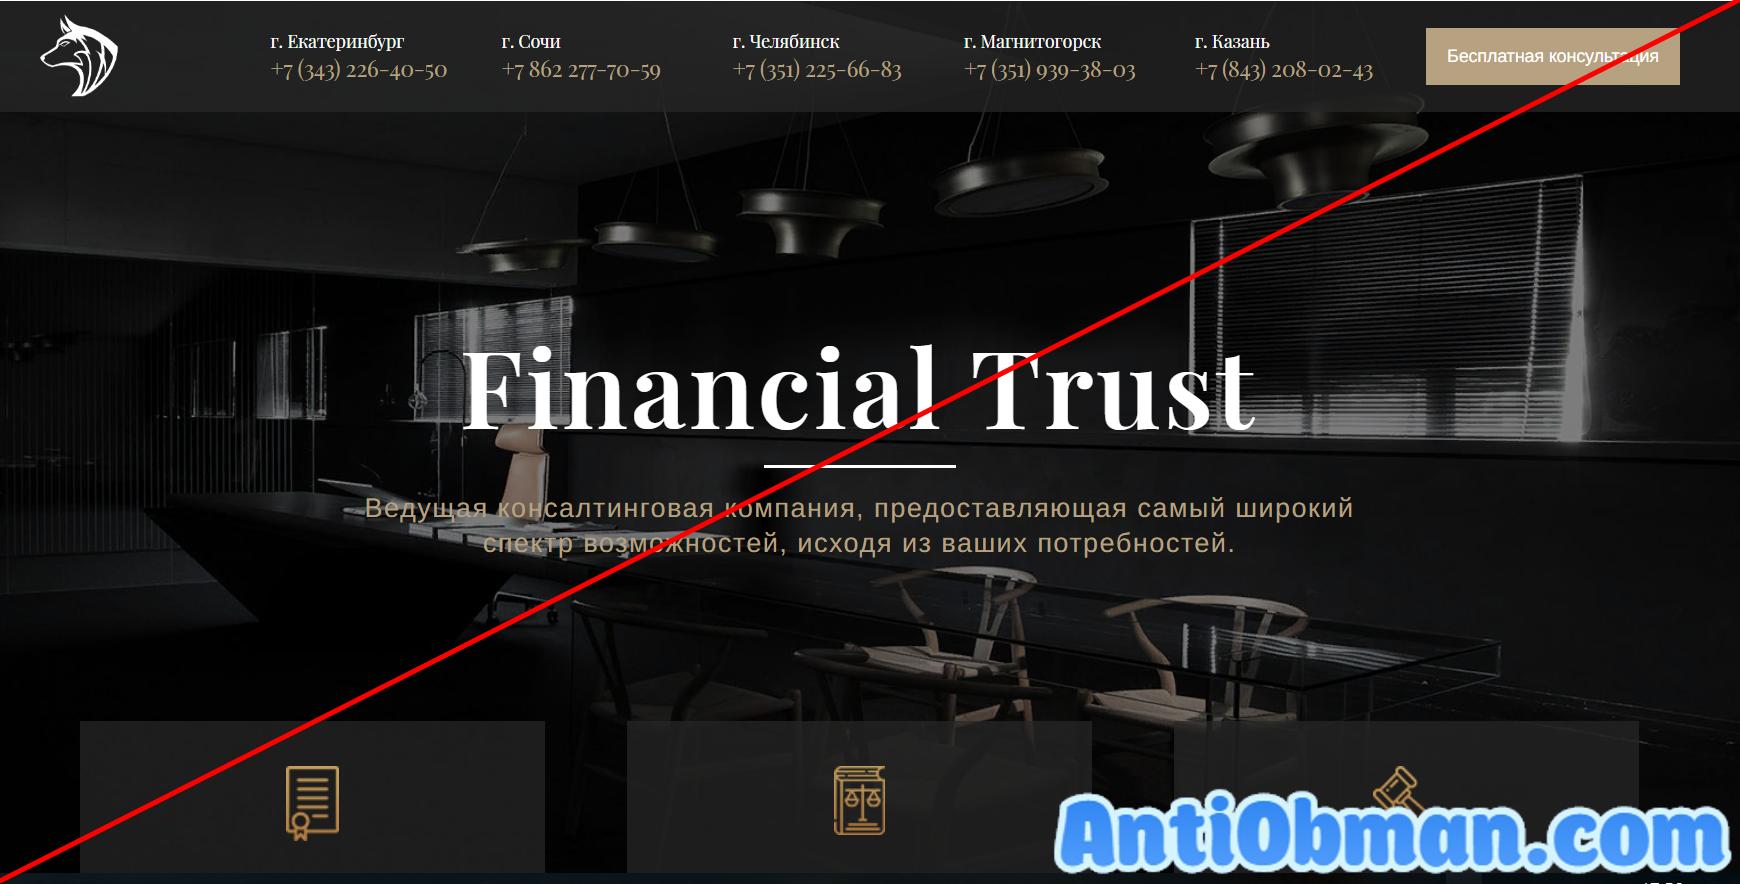 Financial Trust - отзывы